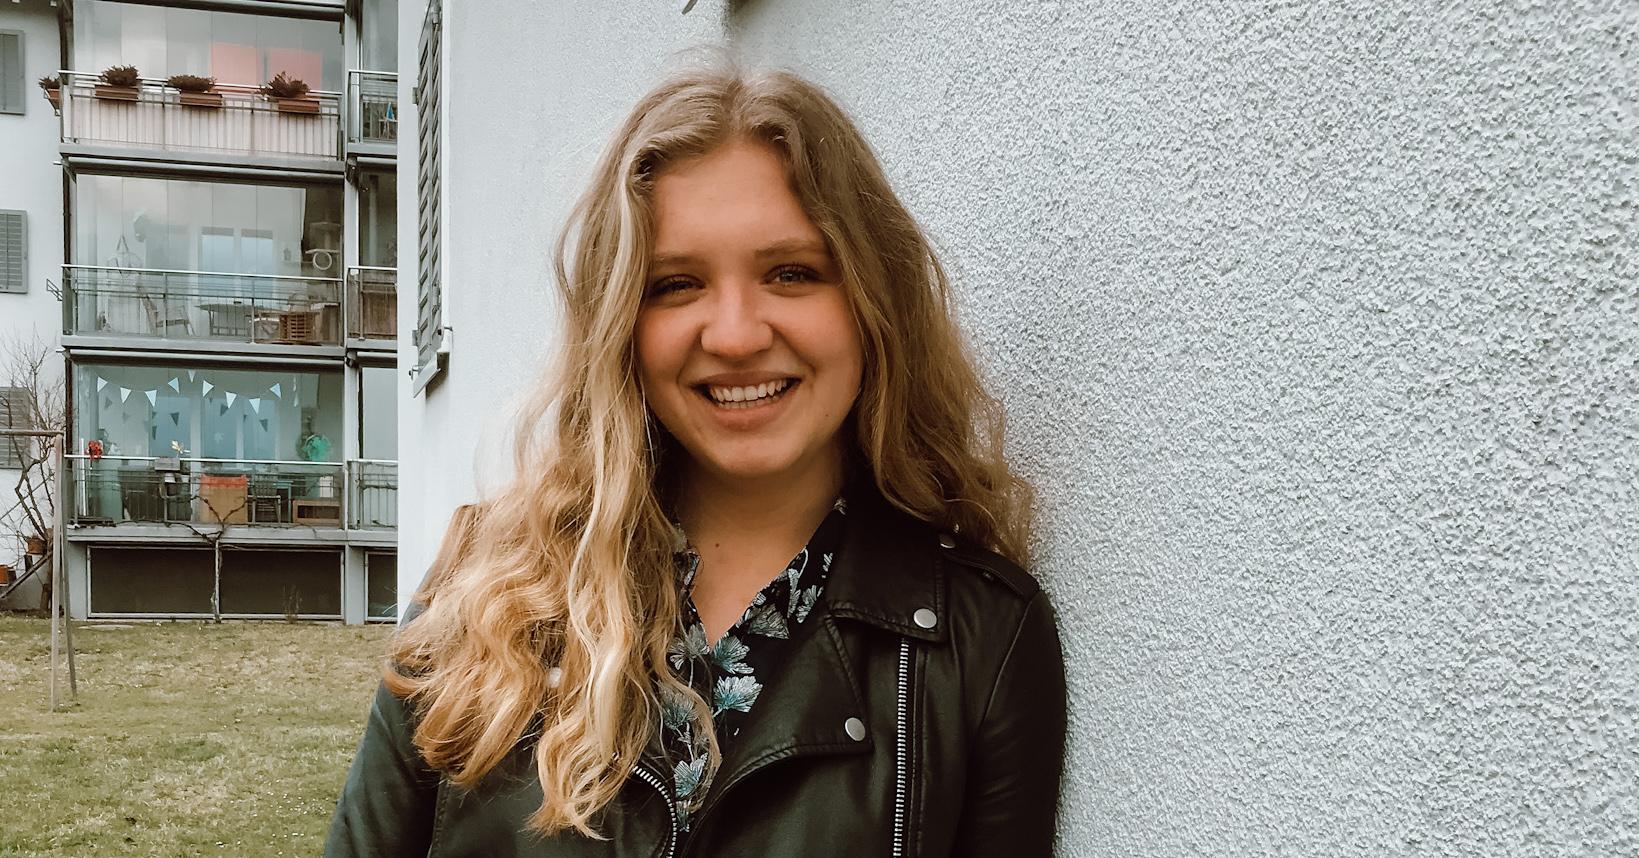 Nora Züst ist Studentin Bachelorstudiengang Kommunikation am IAM der ZHAW